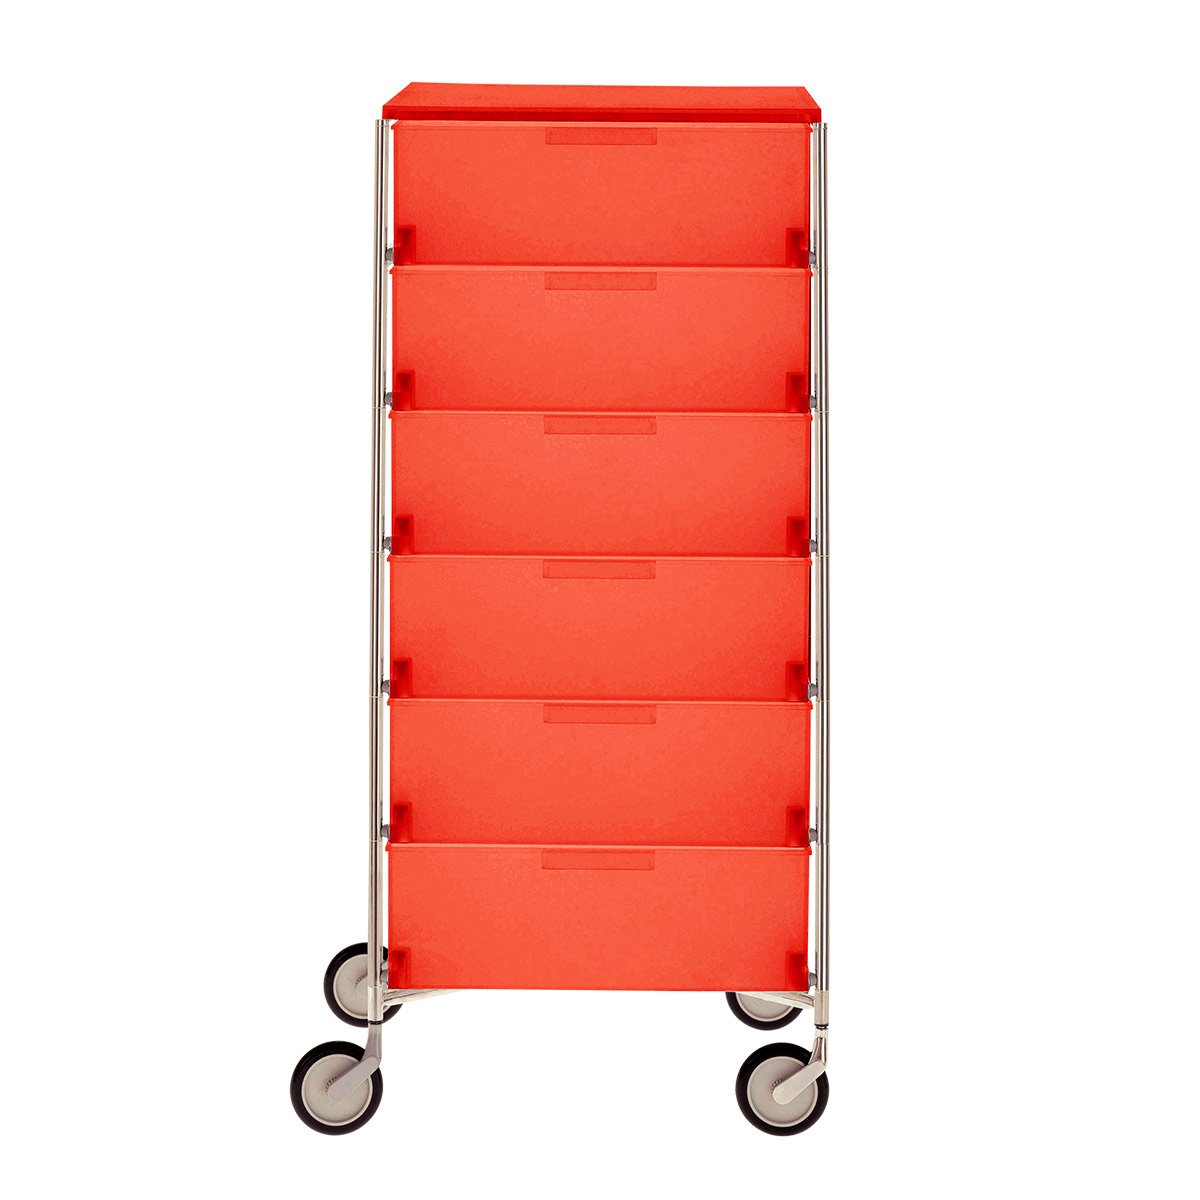 Kartell 2040L4 Container Mobil, 6 Schubladen, dunkelorange